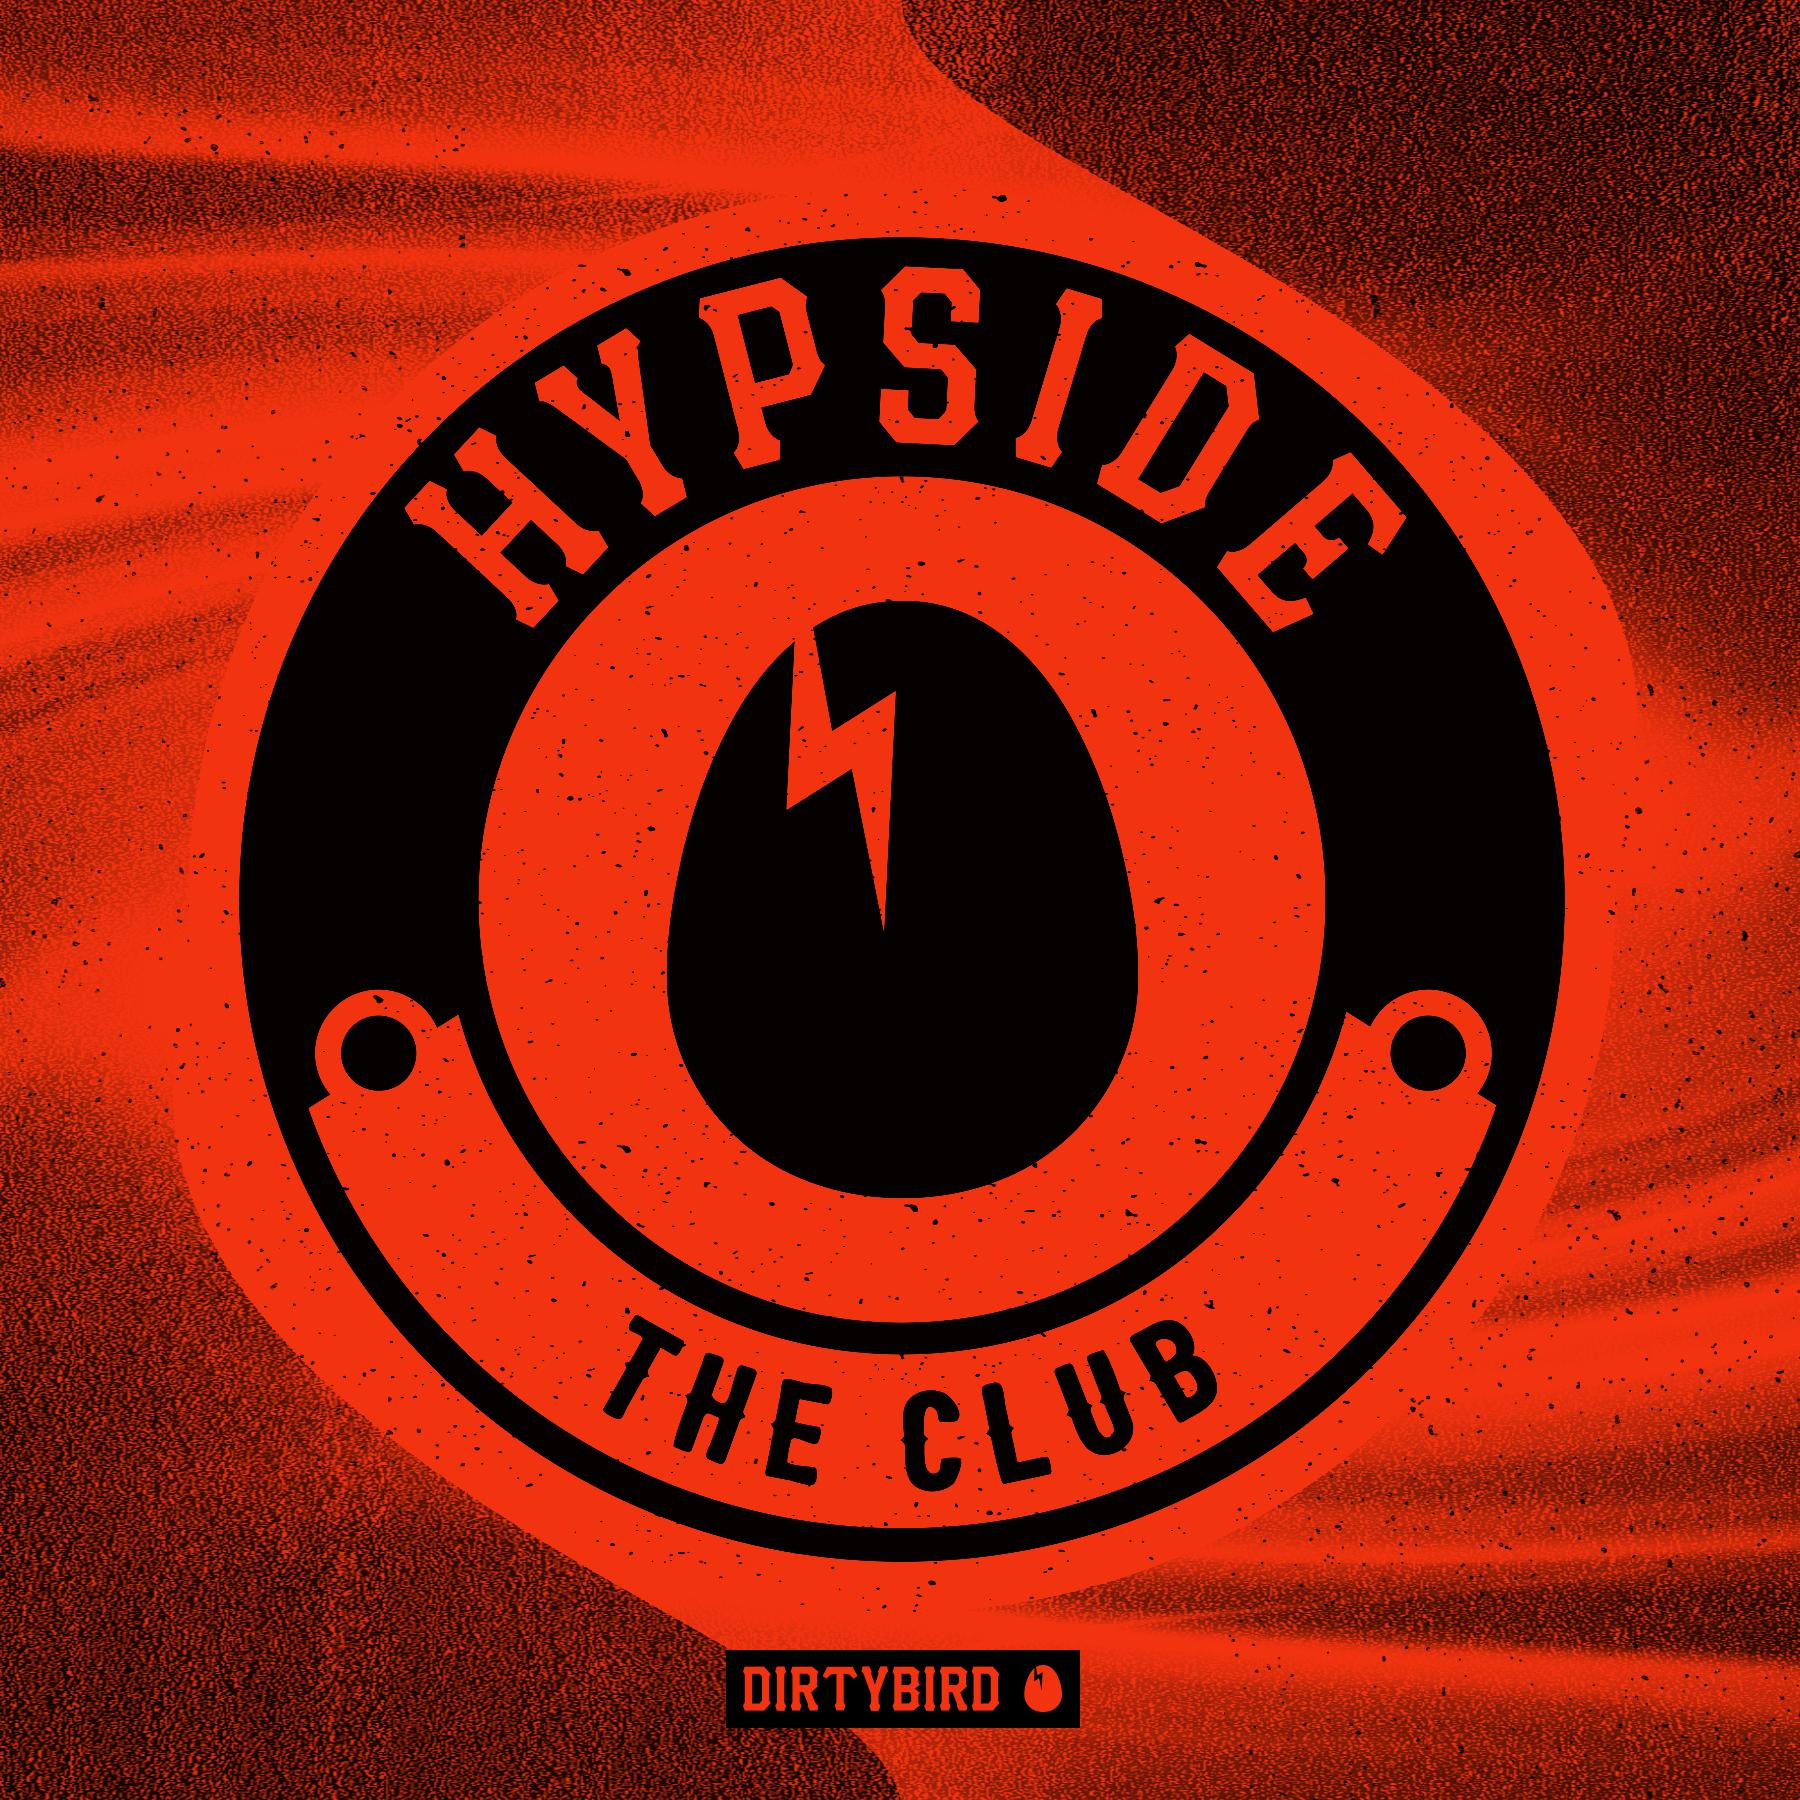 Birdfeed hypside theclub